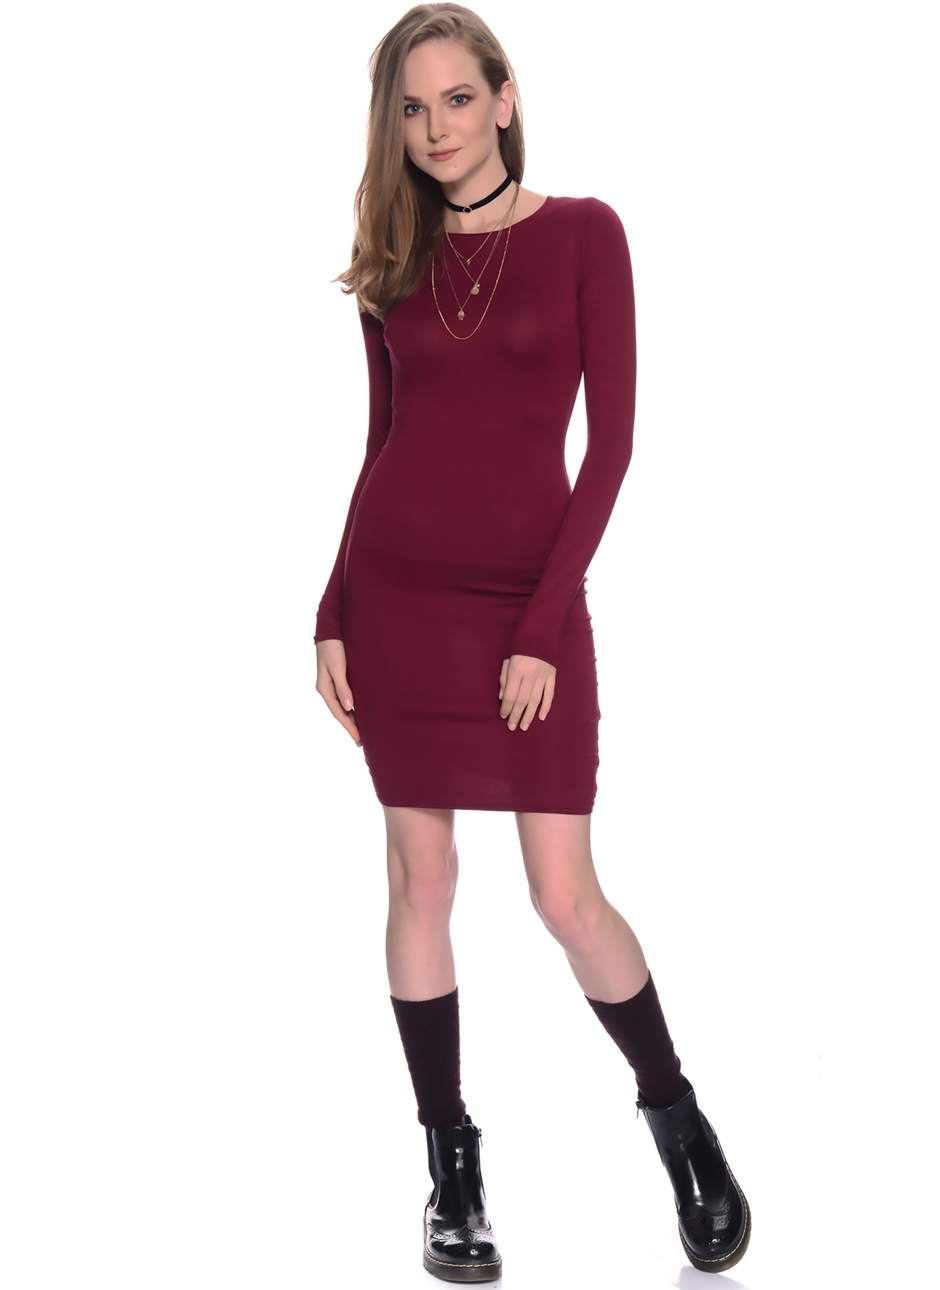 Missguided Elbise 38 5000136453002 Ürün Resmi